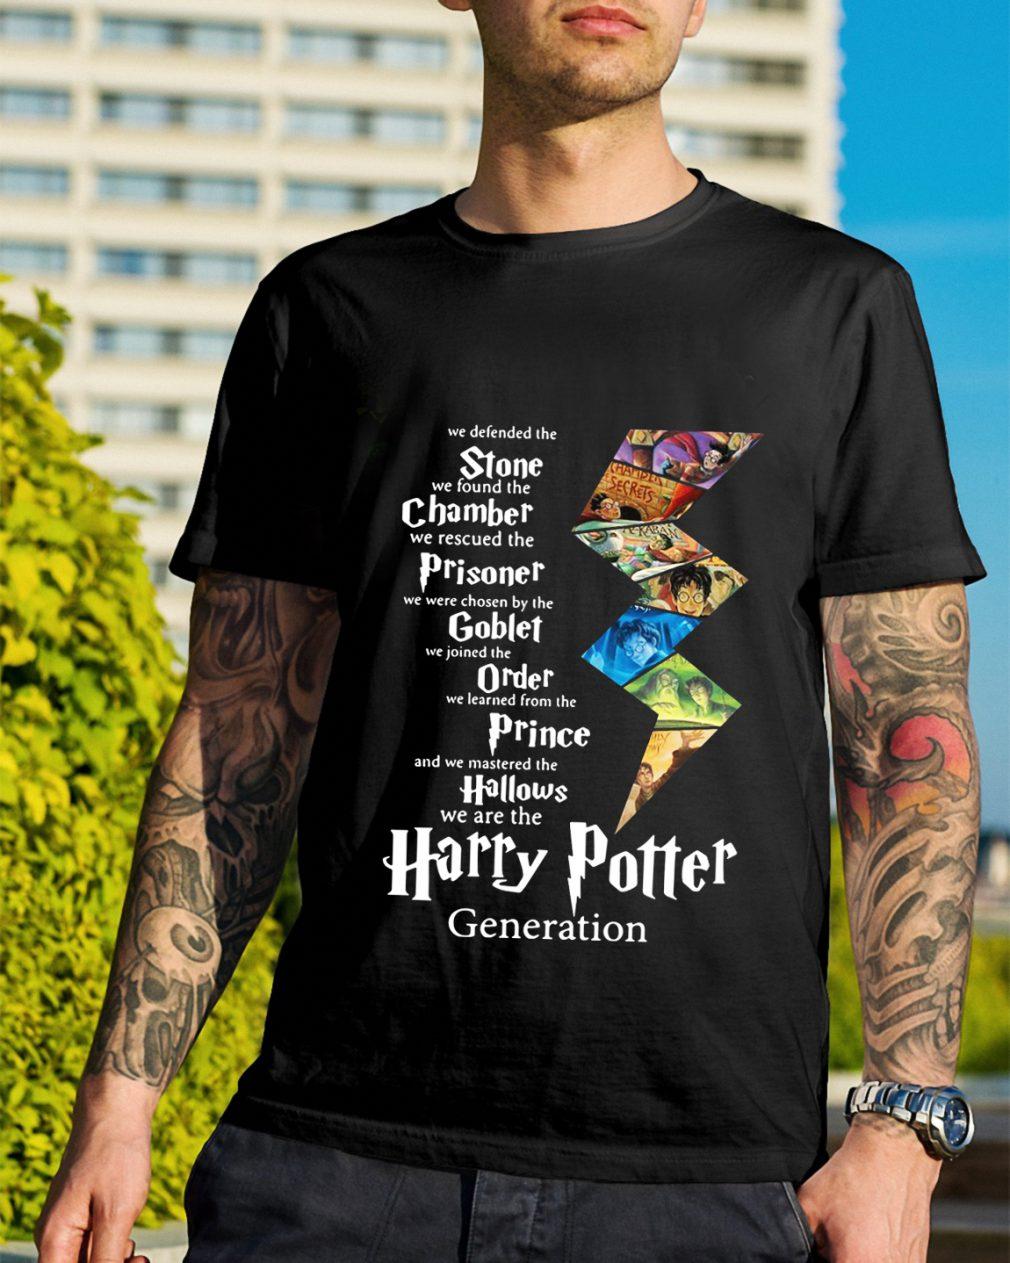 Stone Chamber Prisoner Goblet Order Prince Hallows Harry Potter shirt